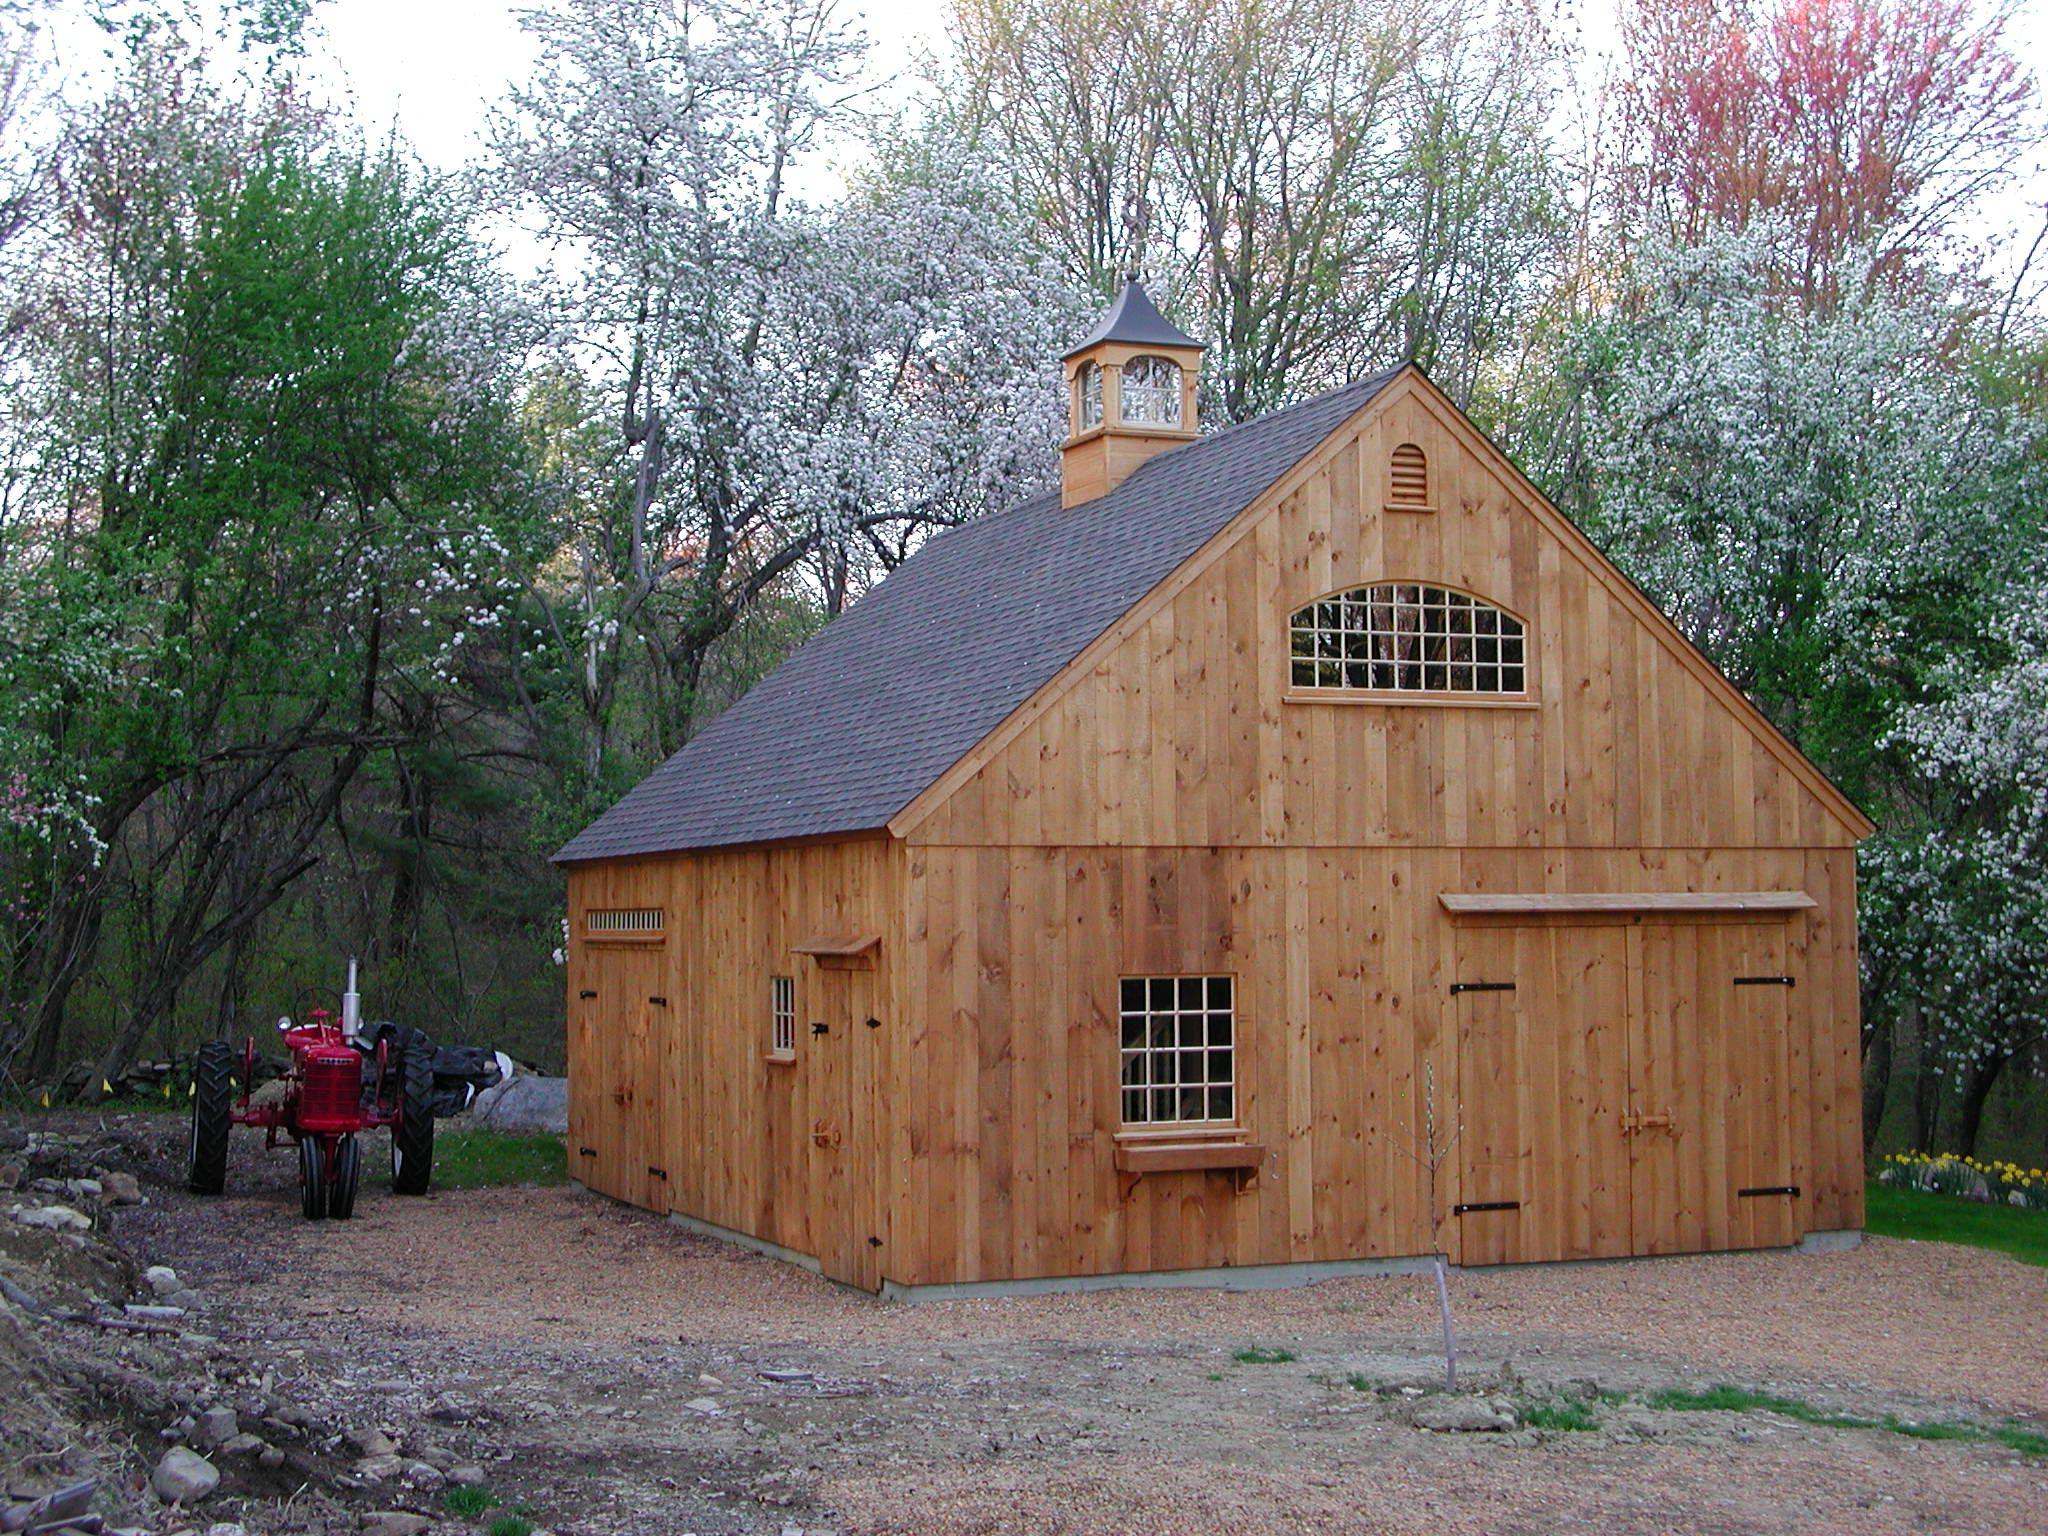 24'x 30' Story Barn